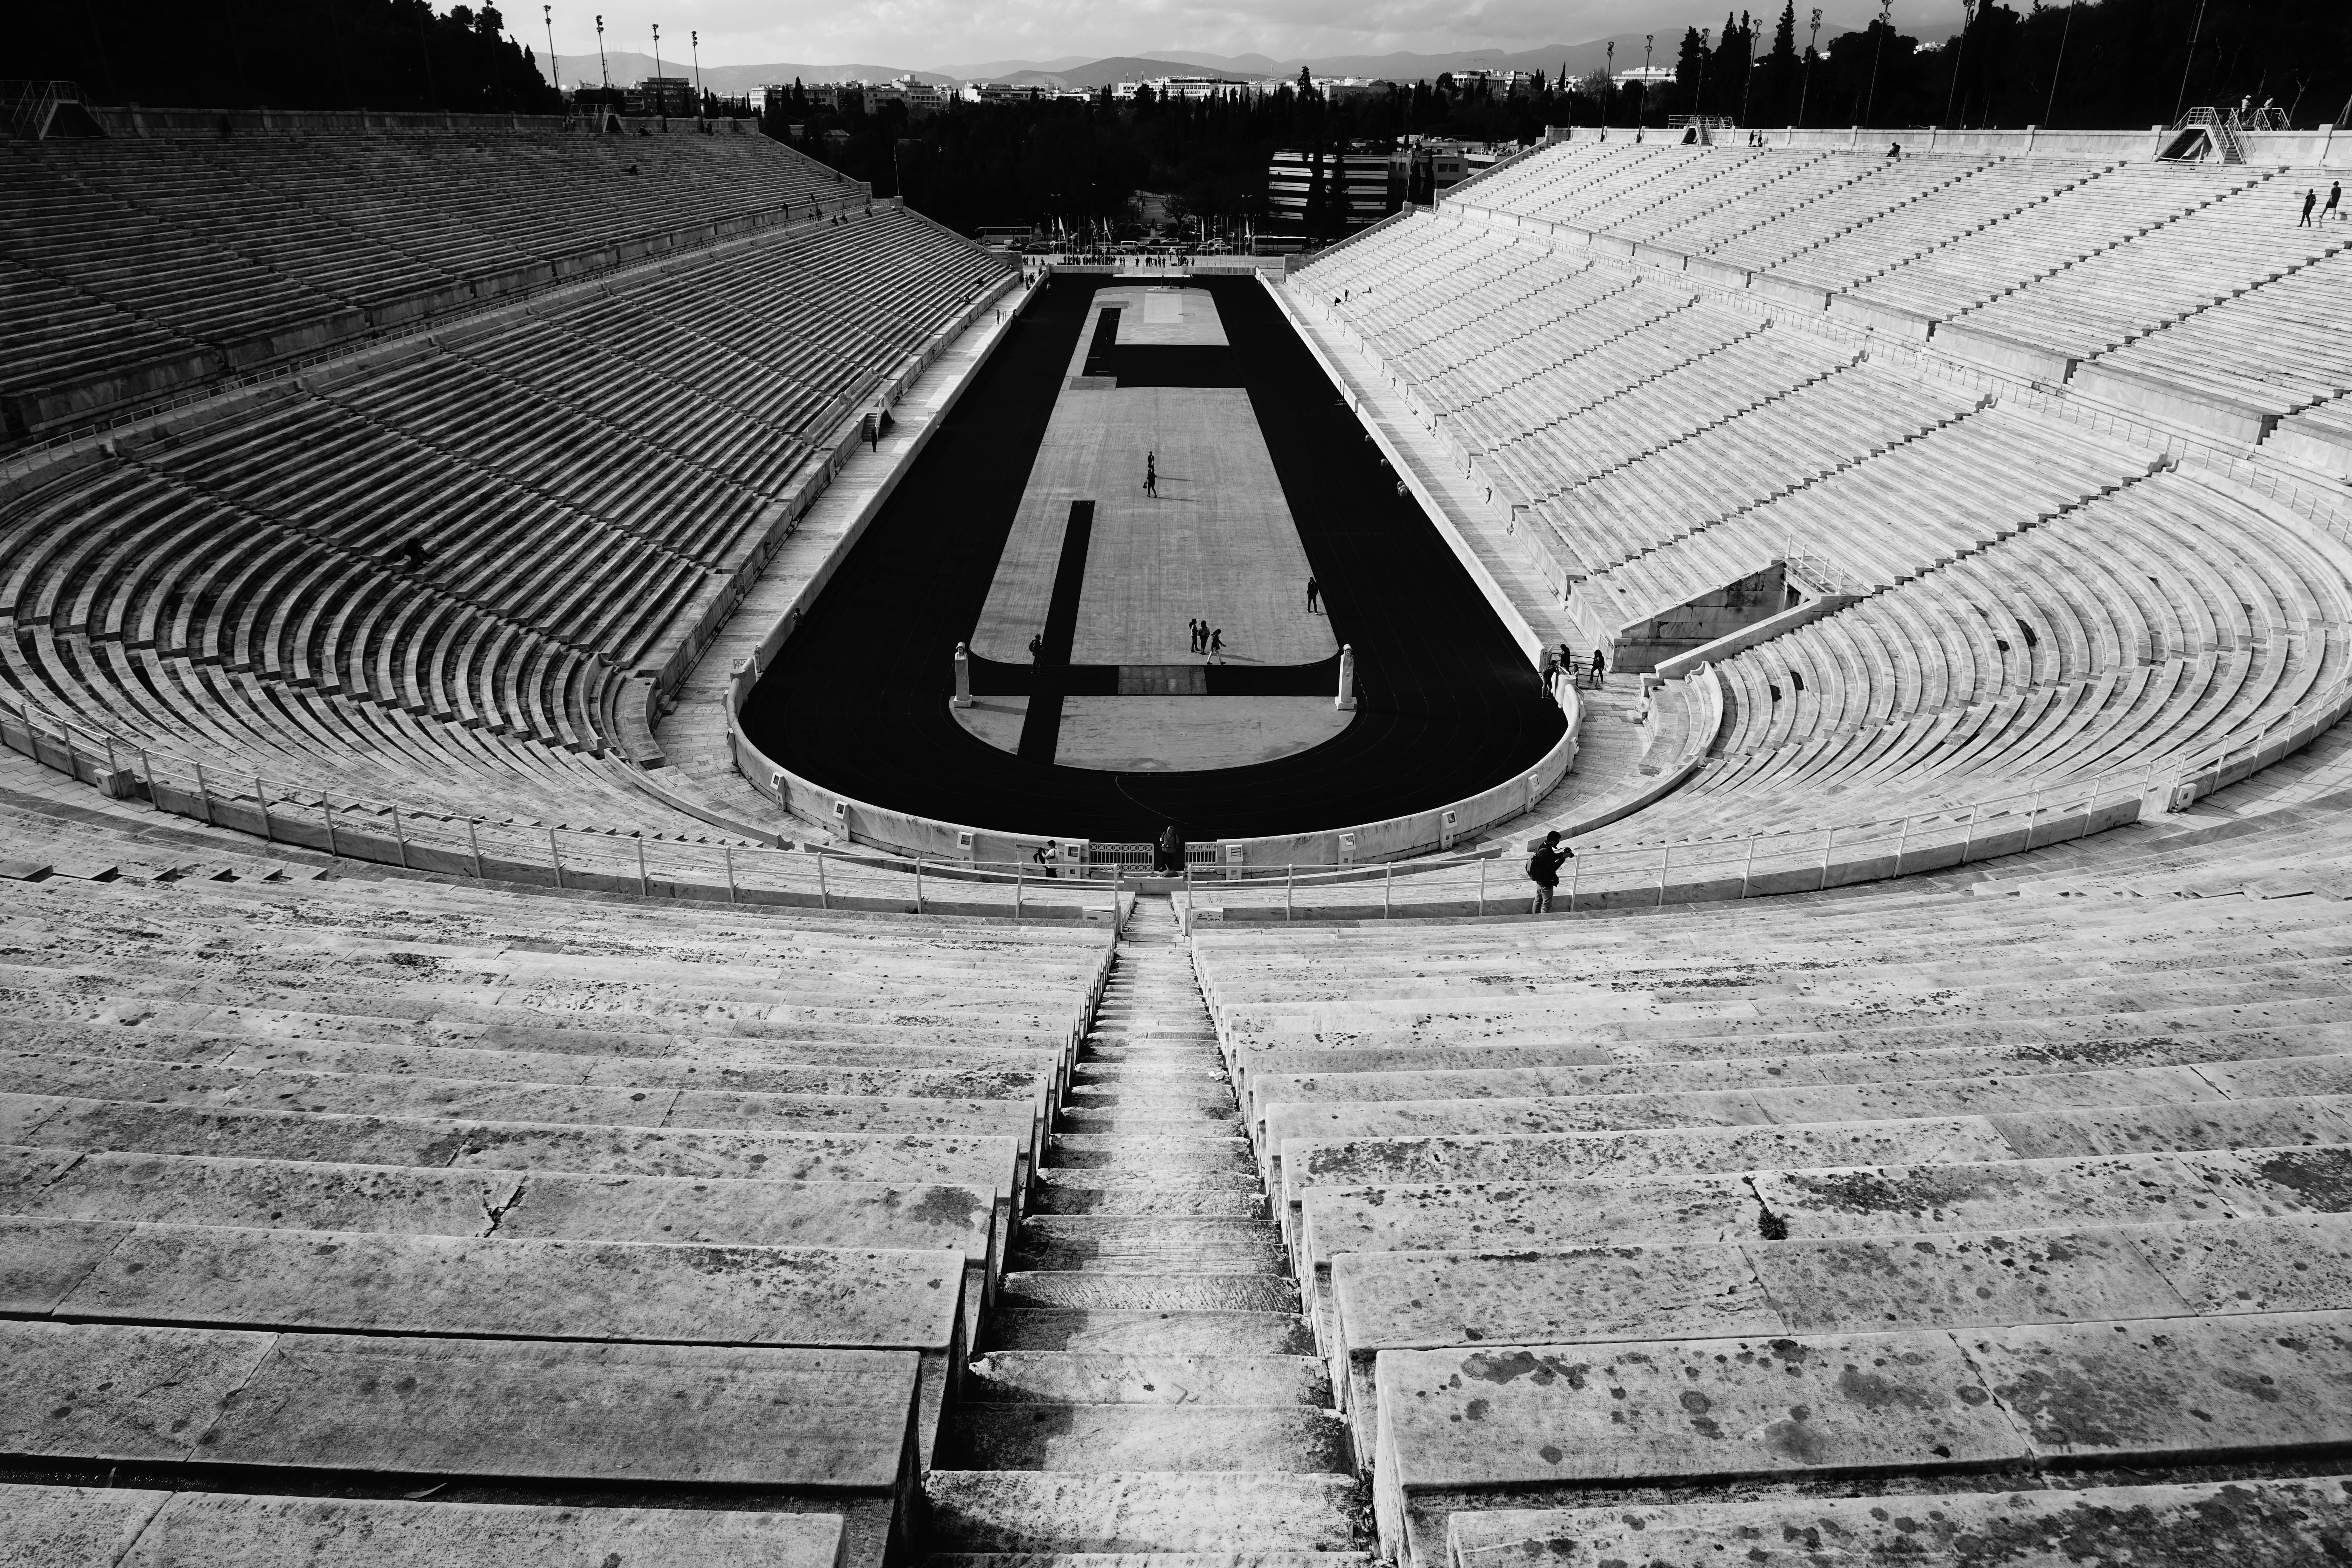 grayscale photography of stadium